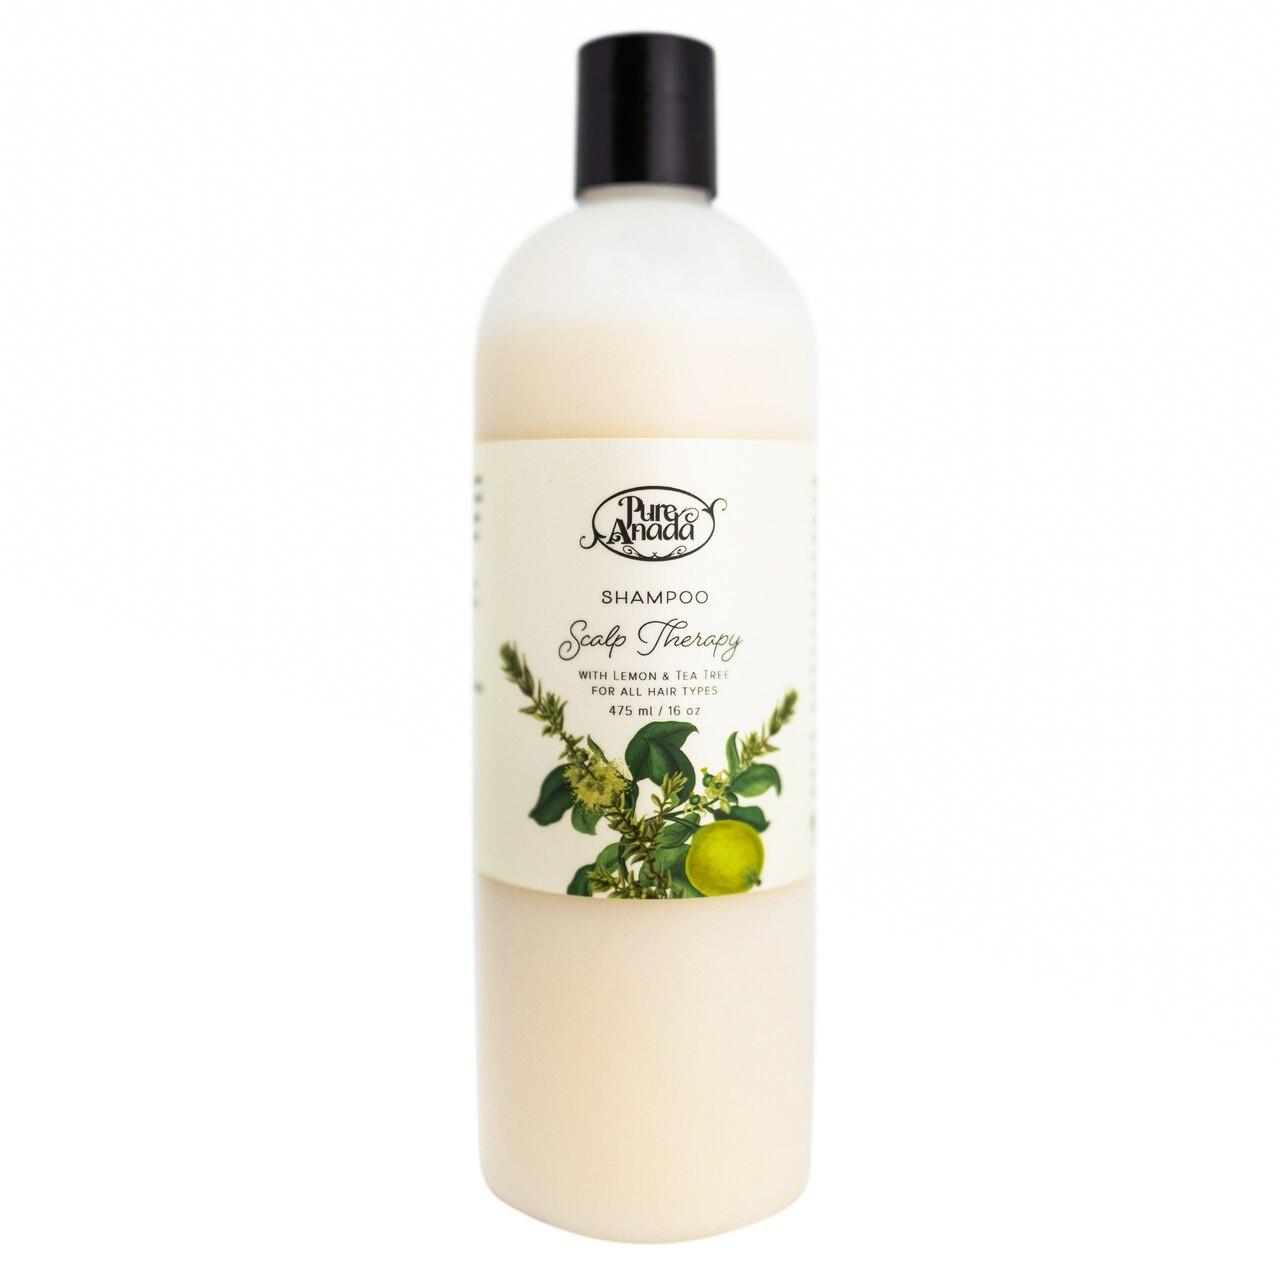 Shampoo - Scalp Therapy with Lemon & Tea Tree-1